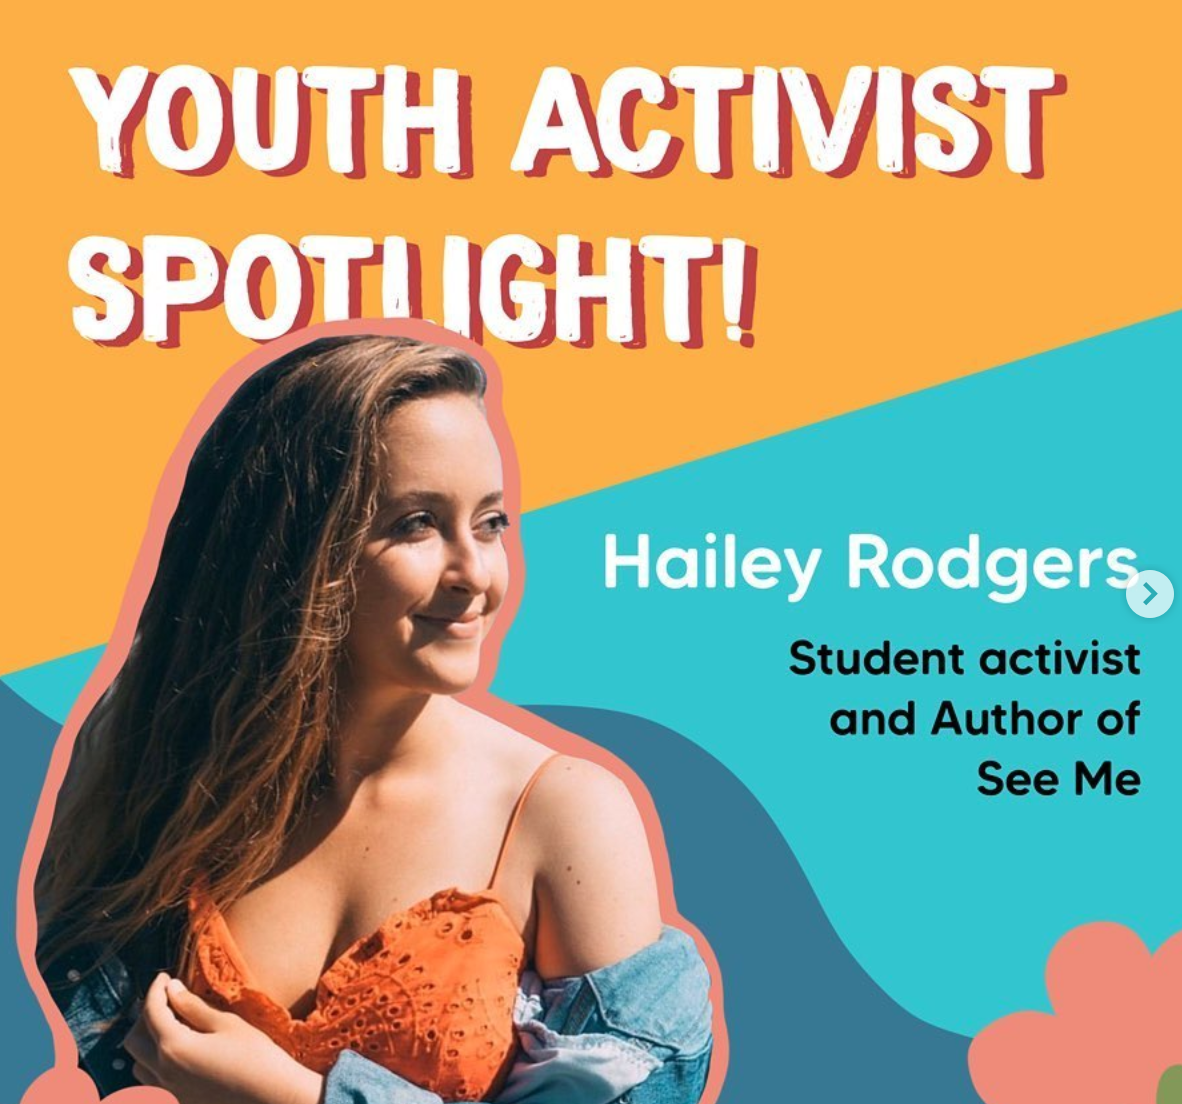 Hailey Rodgers Spotlight